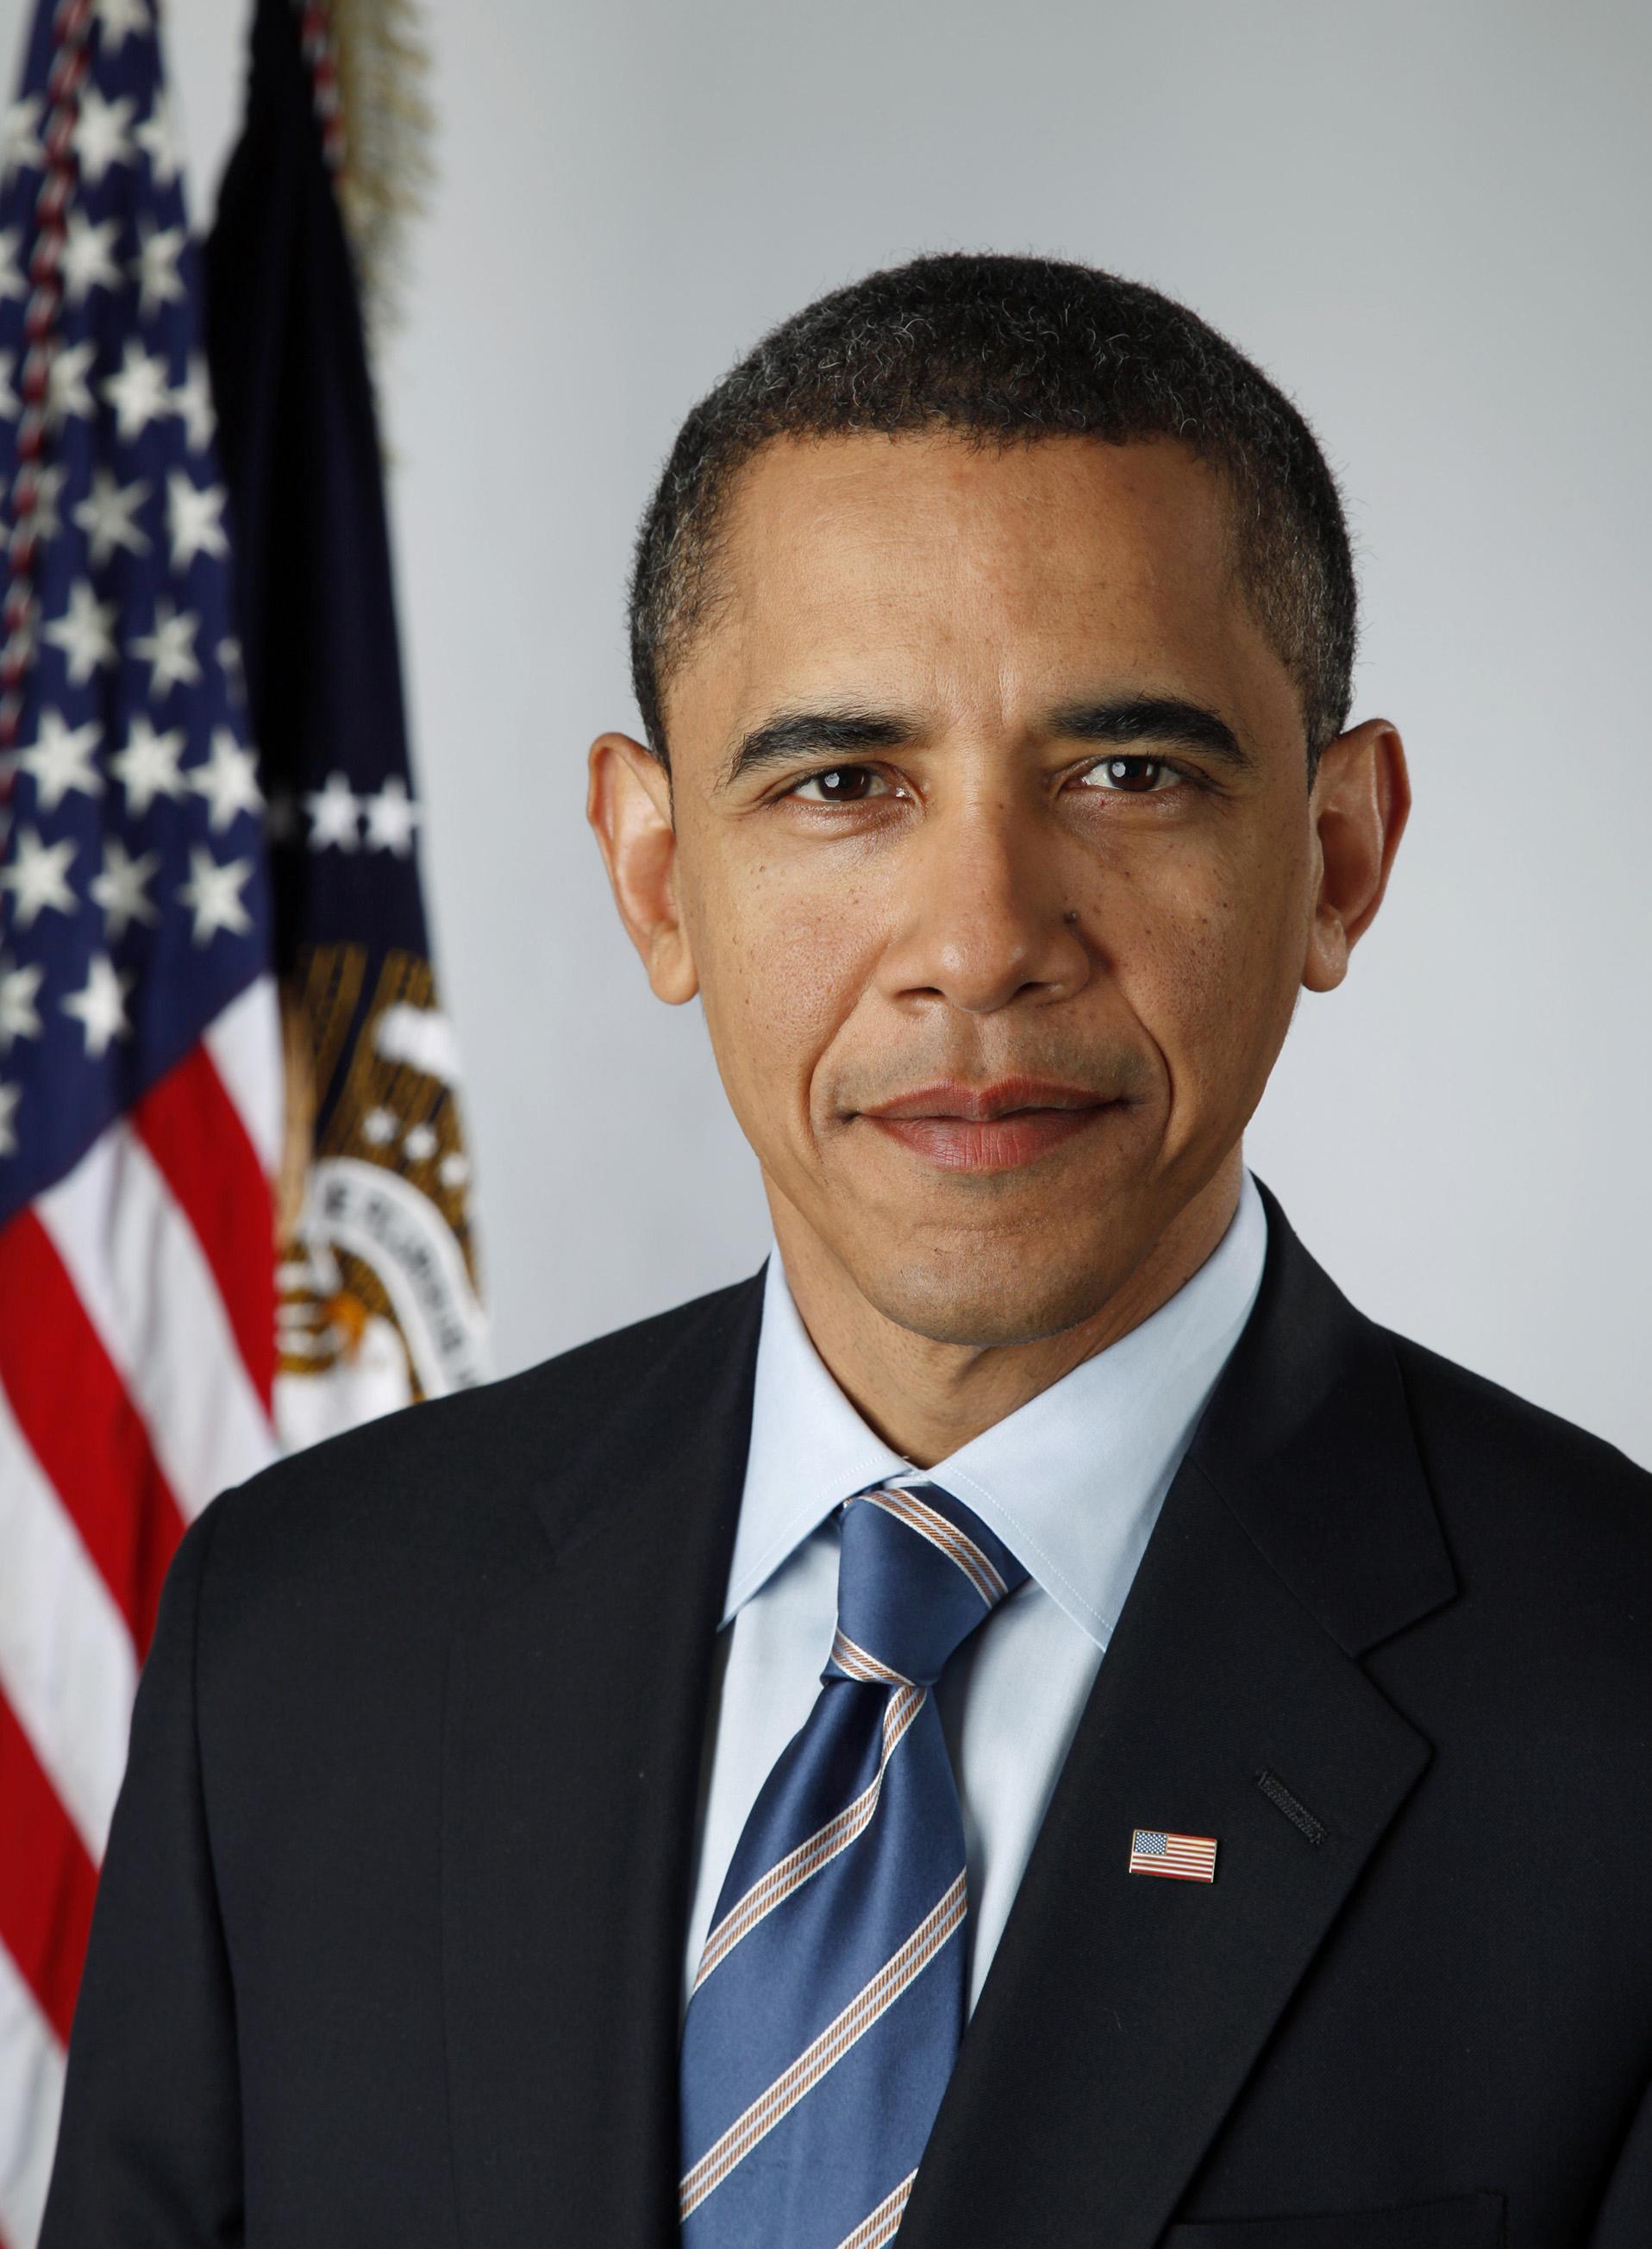 Obama 115 - Copy (2) - Copy.jpg